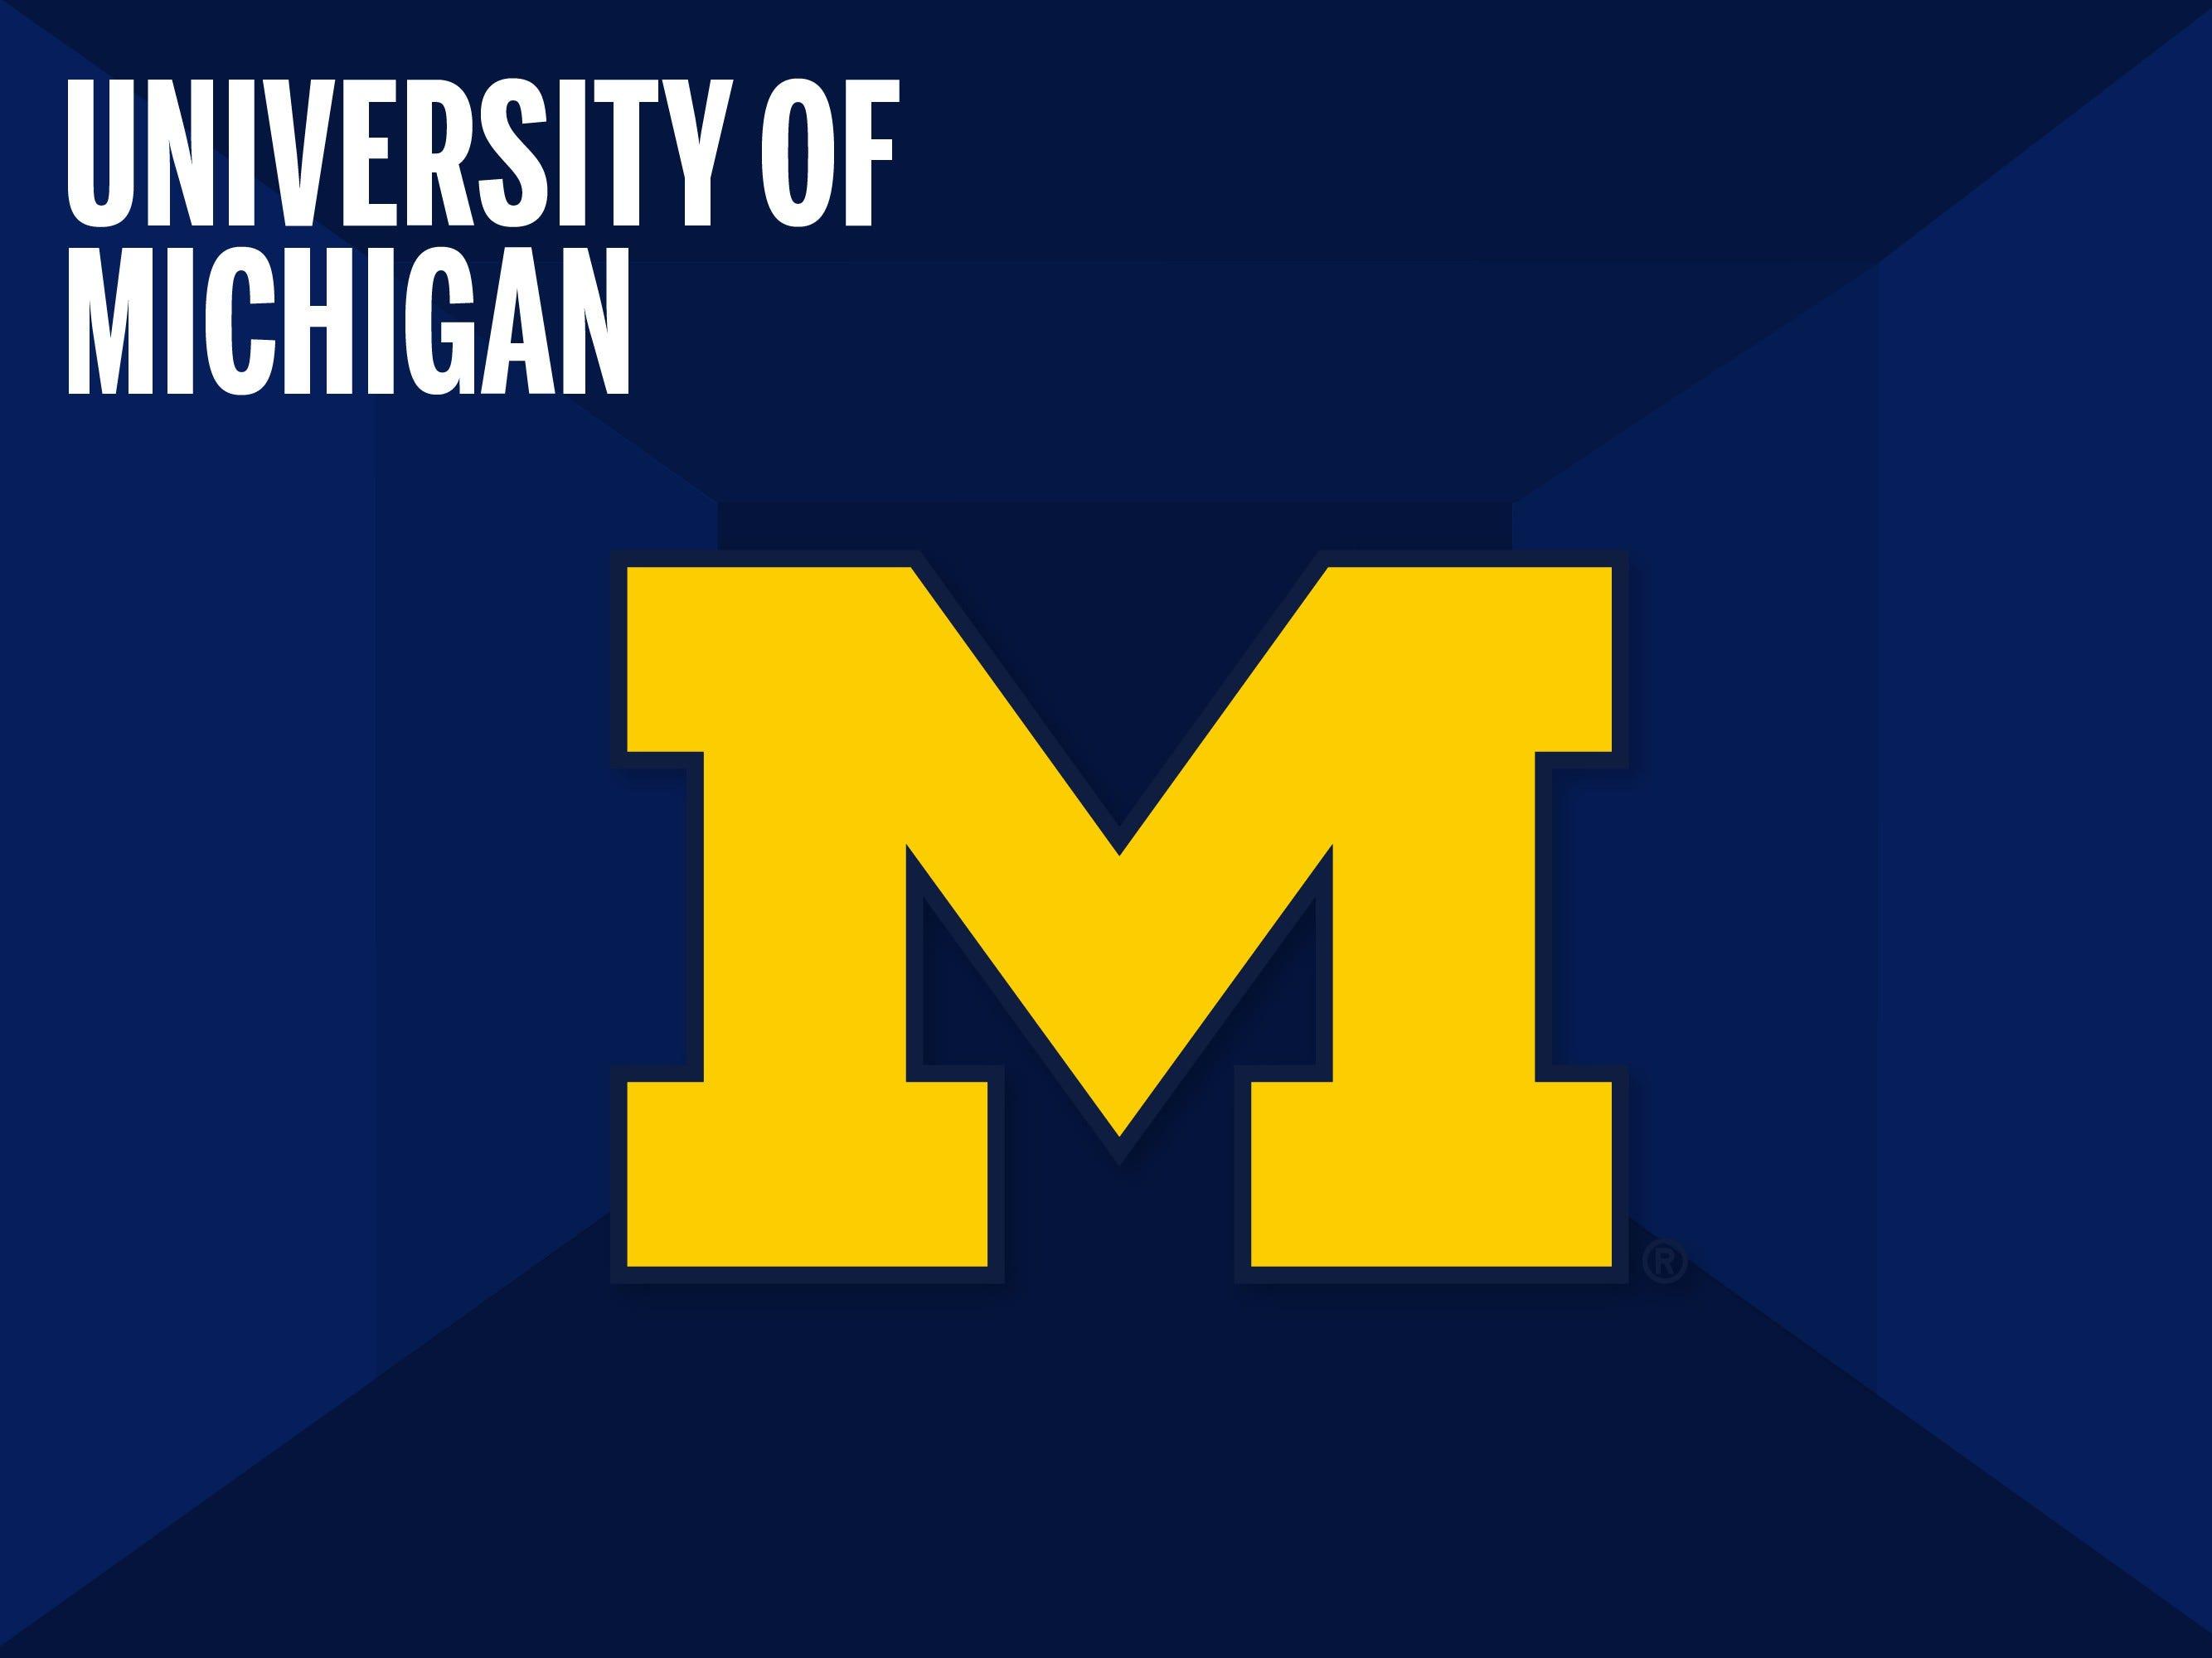 University of Michigan College Football Shop